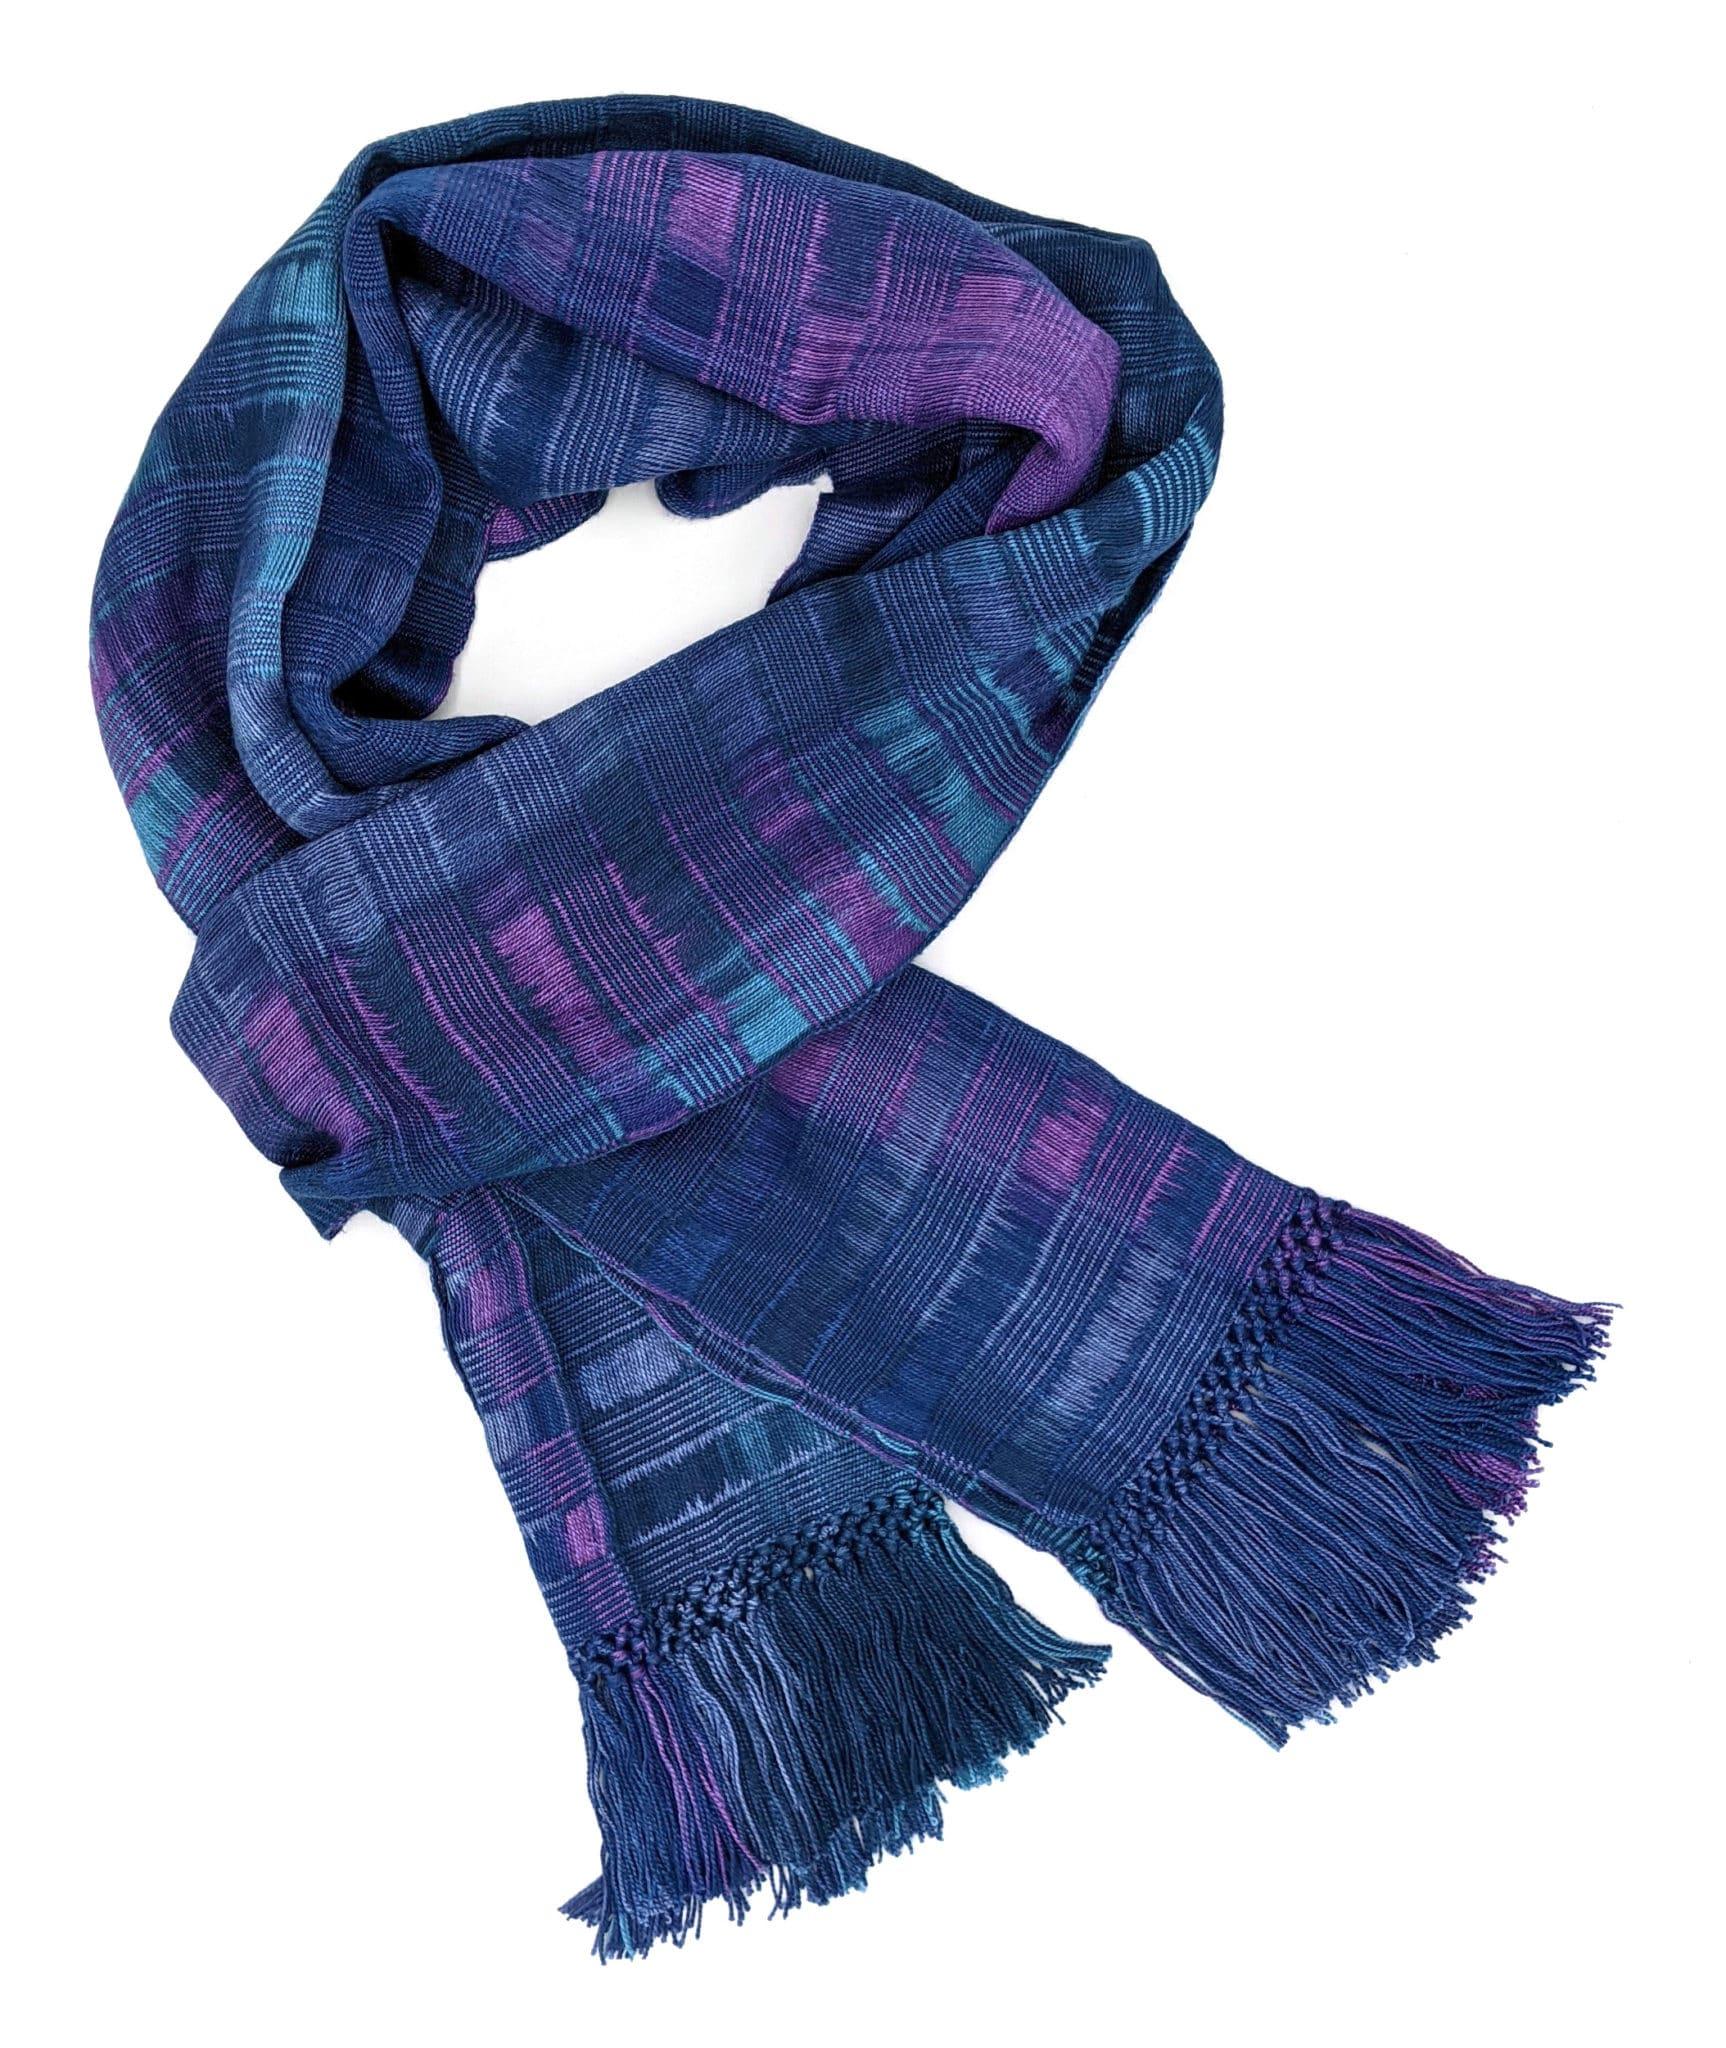 Blues, Purples - Lightweight Bamboo Open-Weave Handwoven Scarf 8 x 68